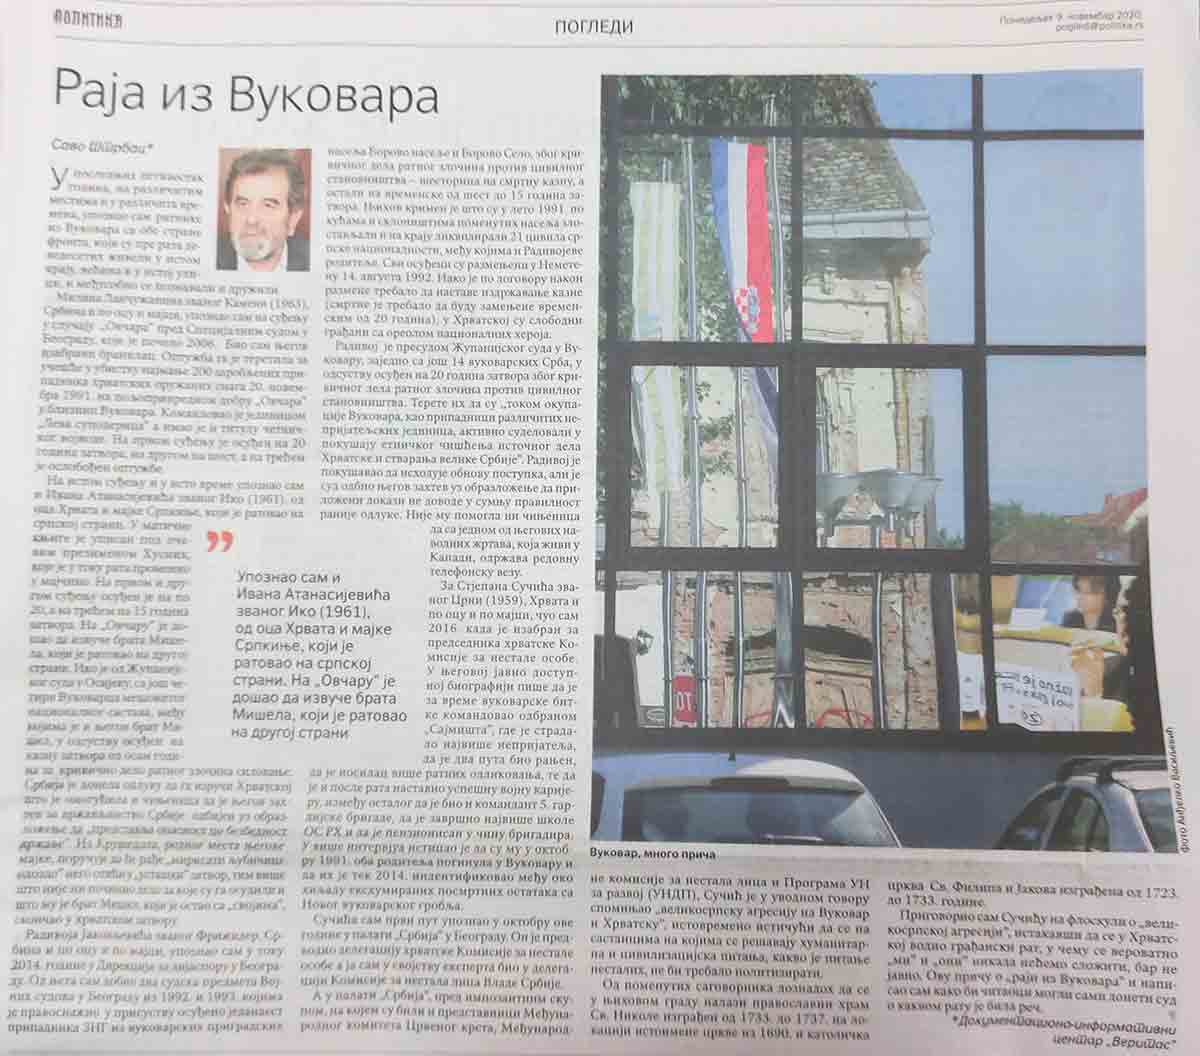 Politika, Savo Štrbac:Raja iz Vukovara, 9.11.2020. Foto: Politika screenshot